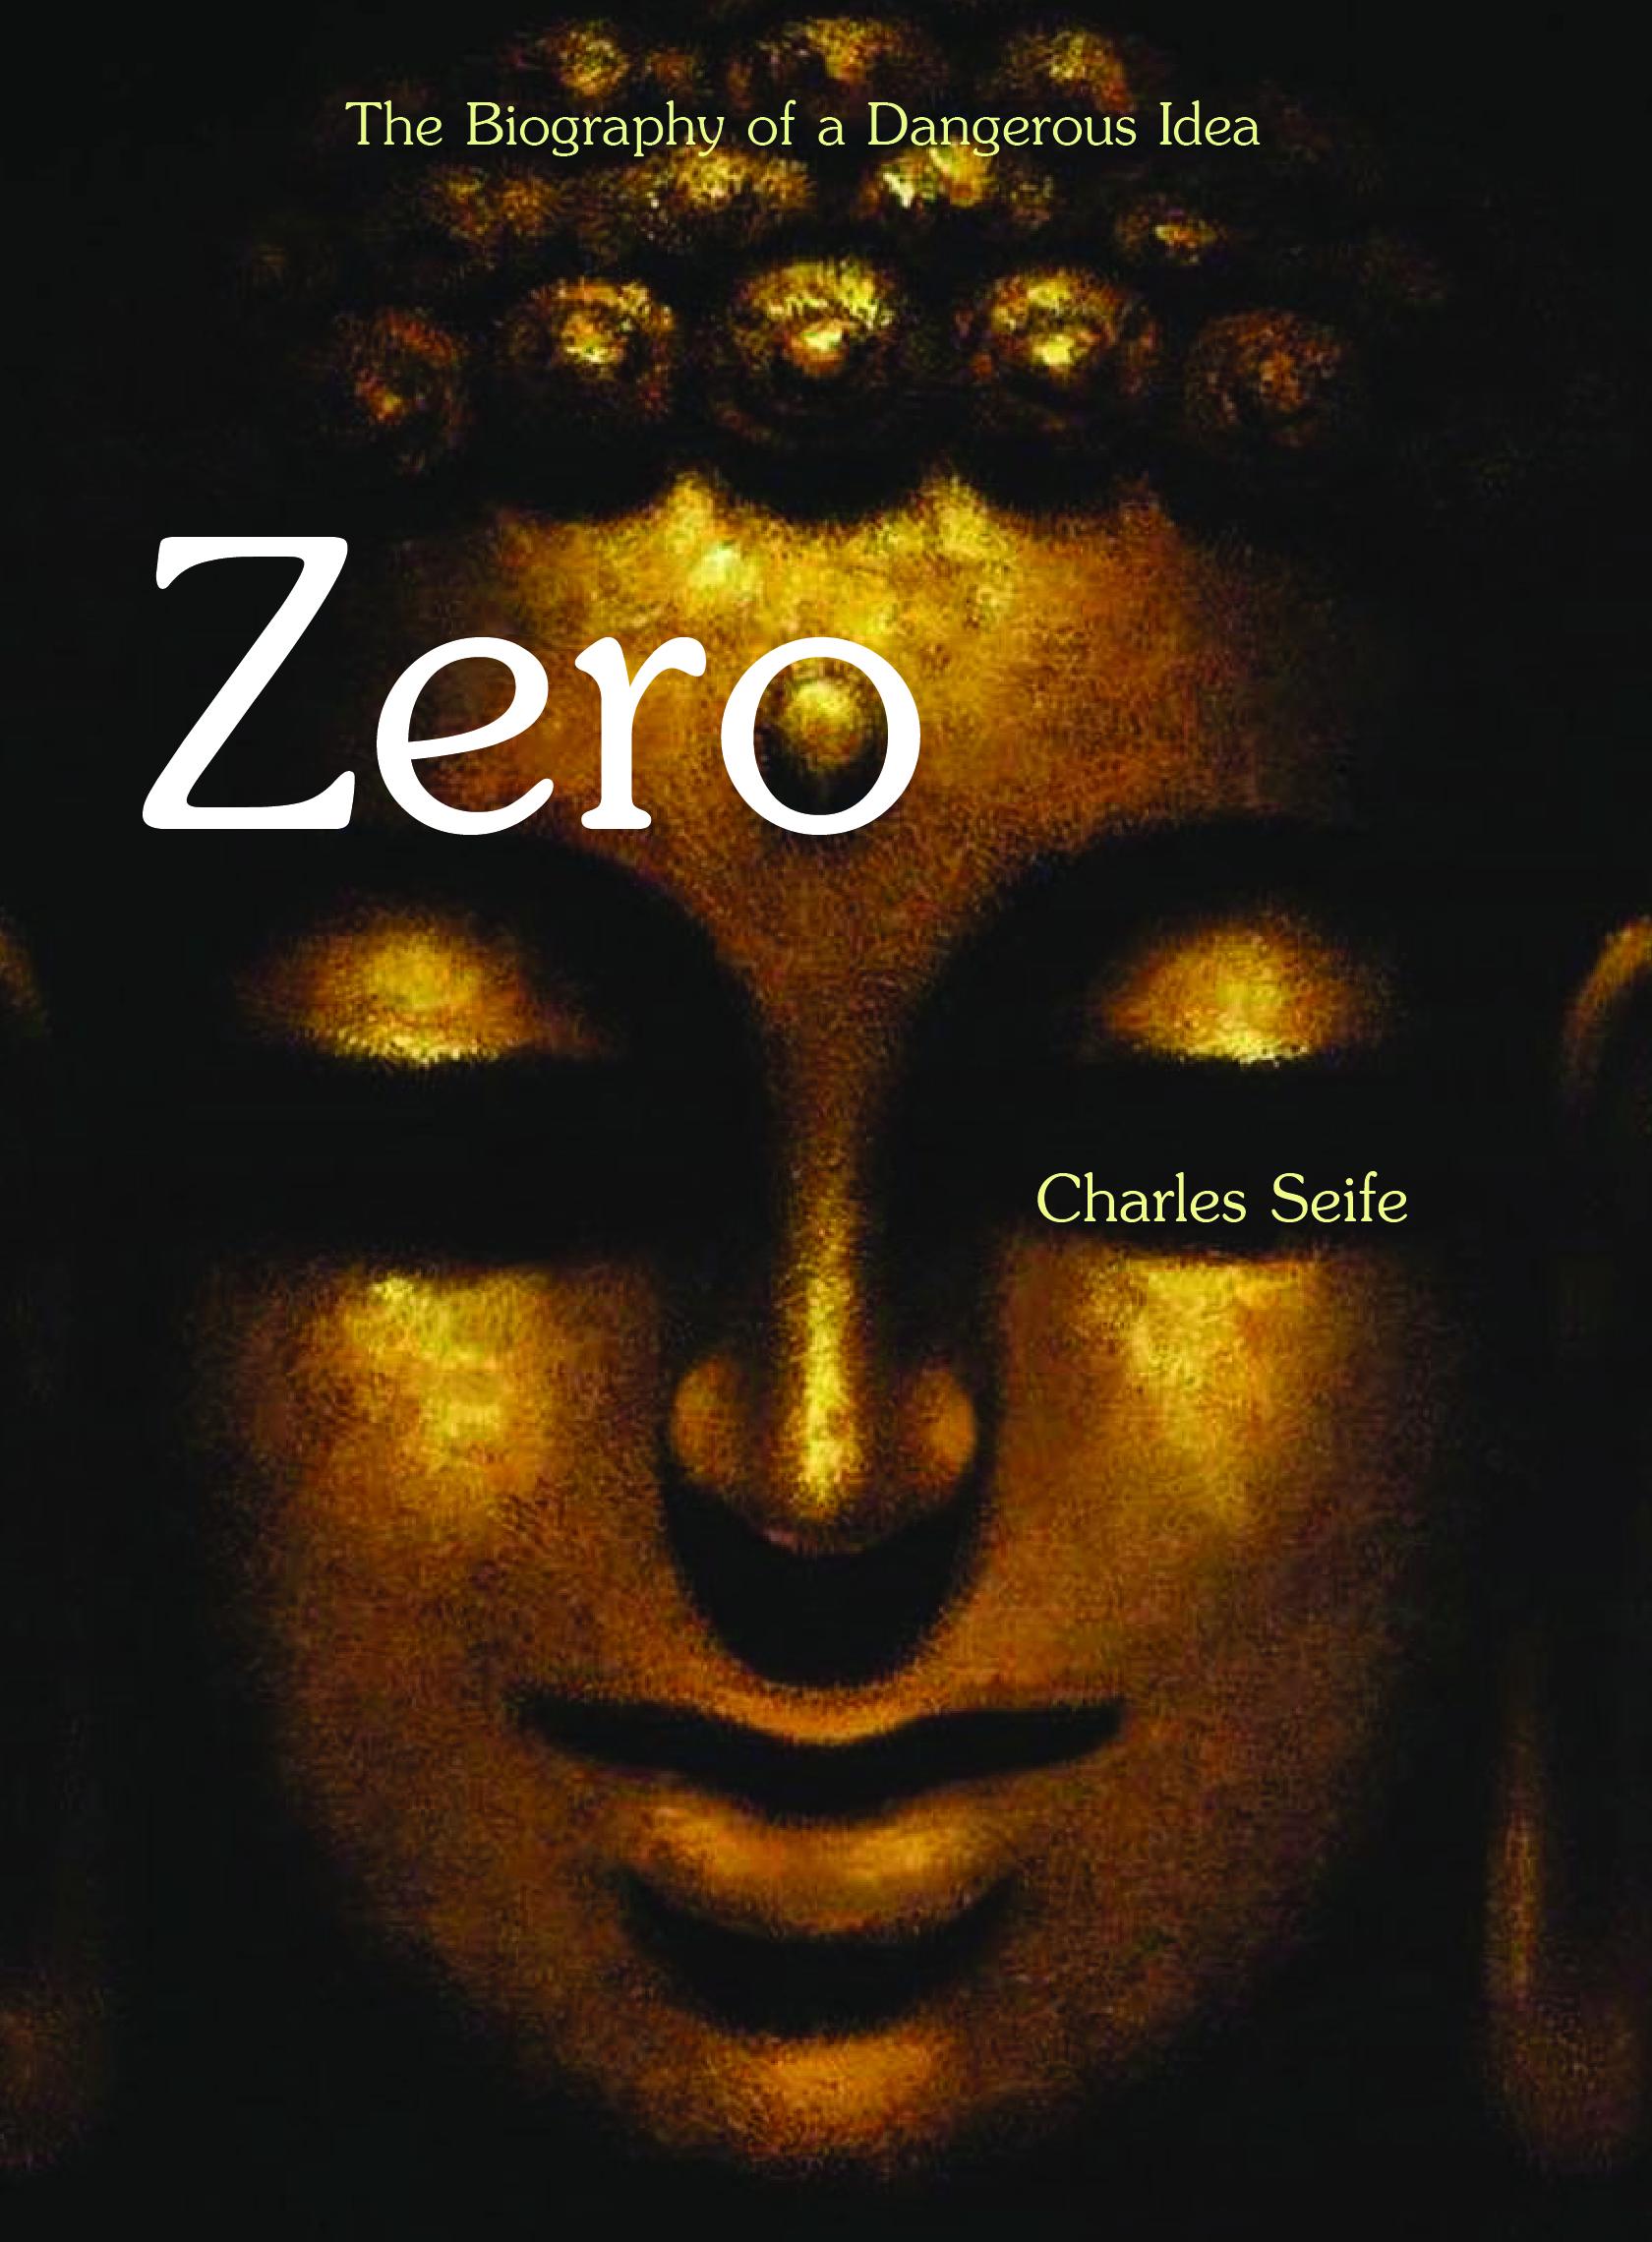 Zero book covers 10-07.jpg